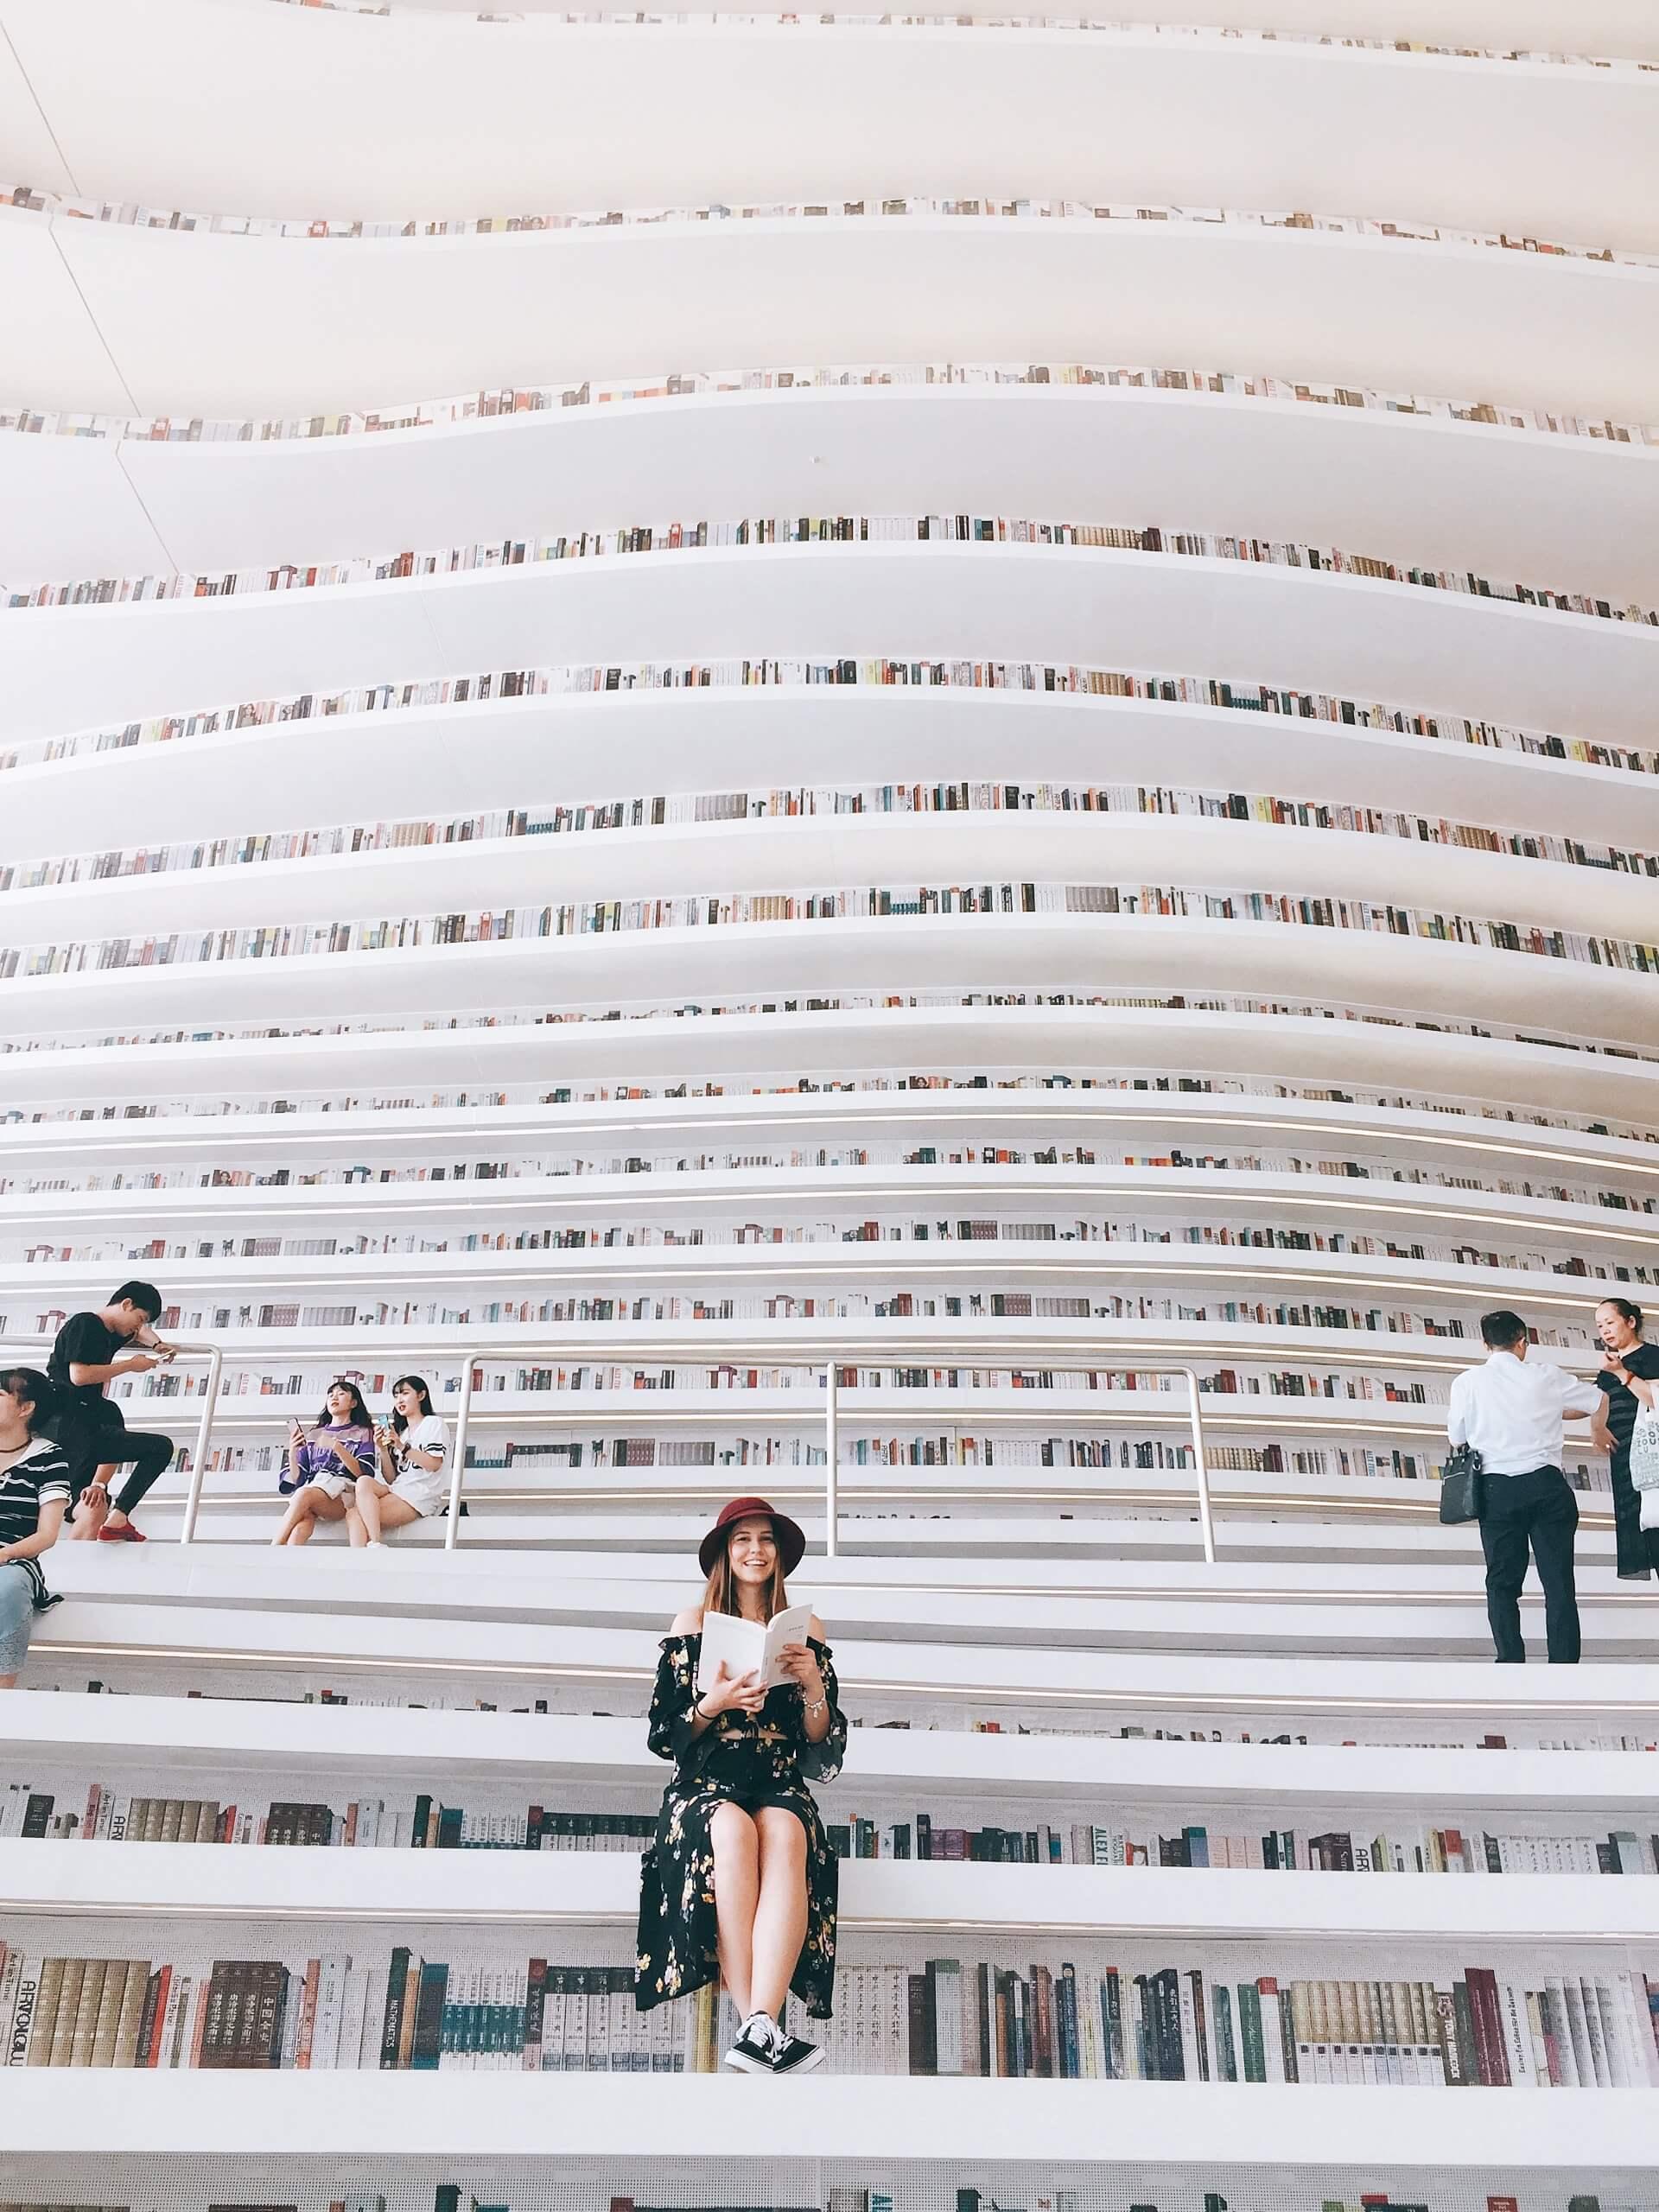 Binhai Kütüphanesi - Tianjin